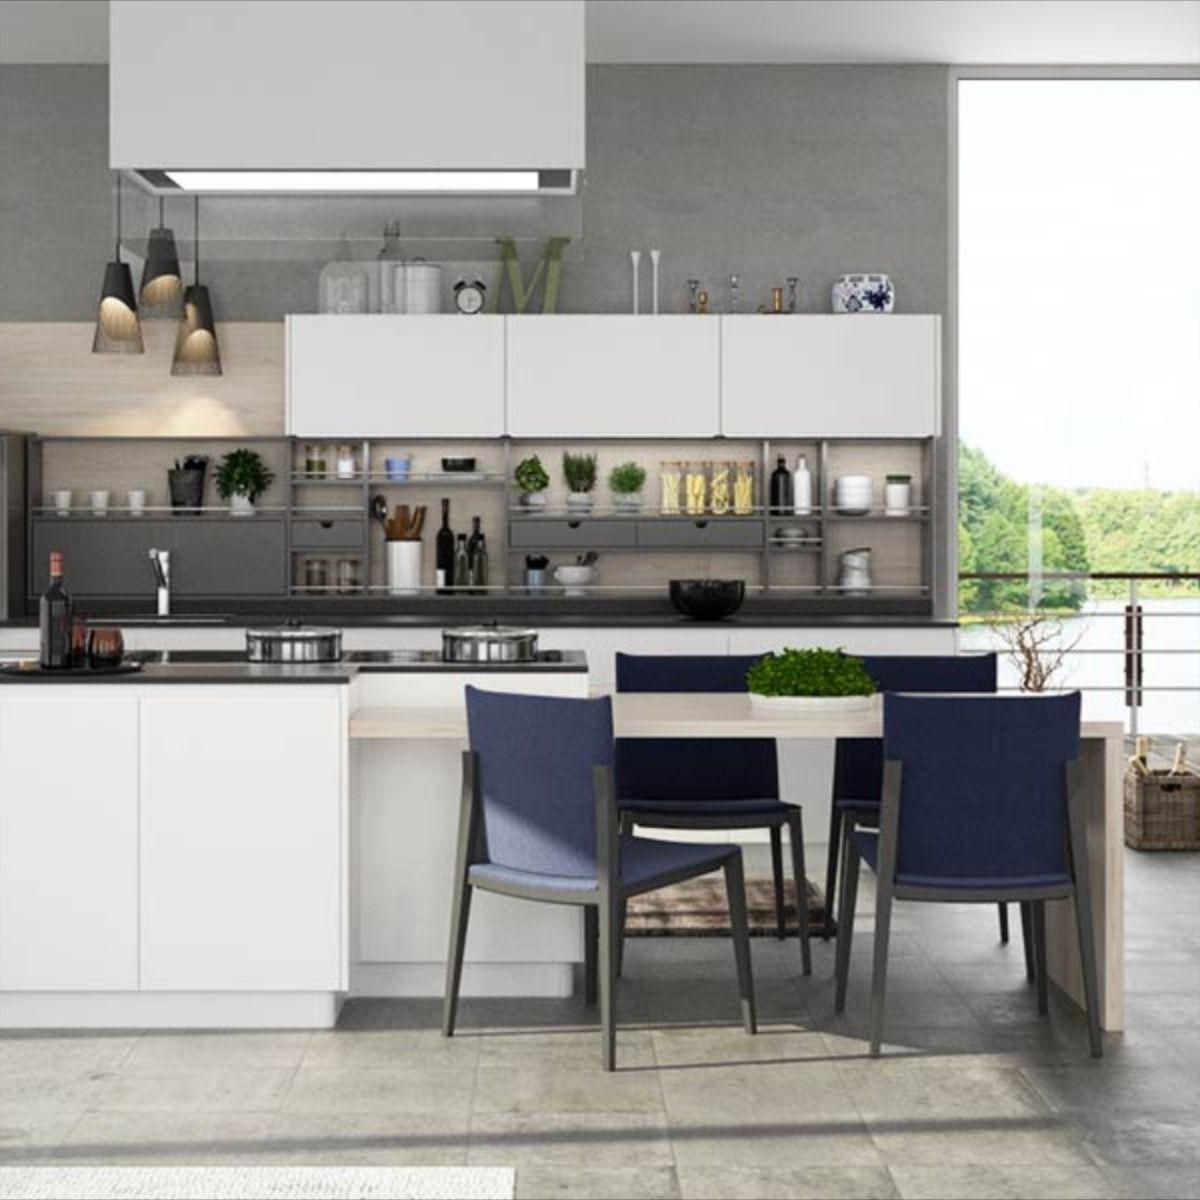 Nl Furniture Modern White And Gray Matte Lacquer Kitchen Cabinet In 2020 Kitchen Cabinets Kitchen Cabinet Manufacturers Kitchen Cabinet Makers